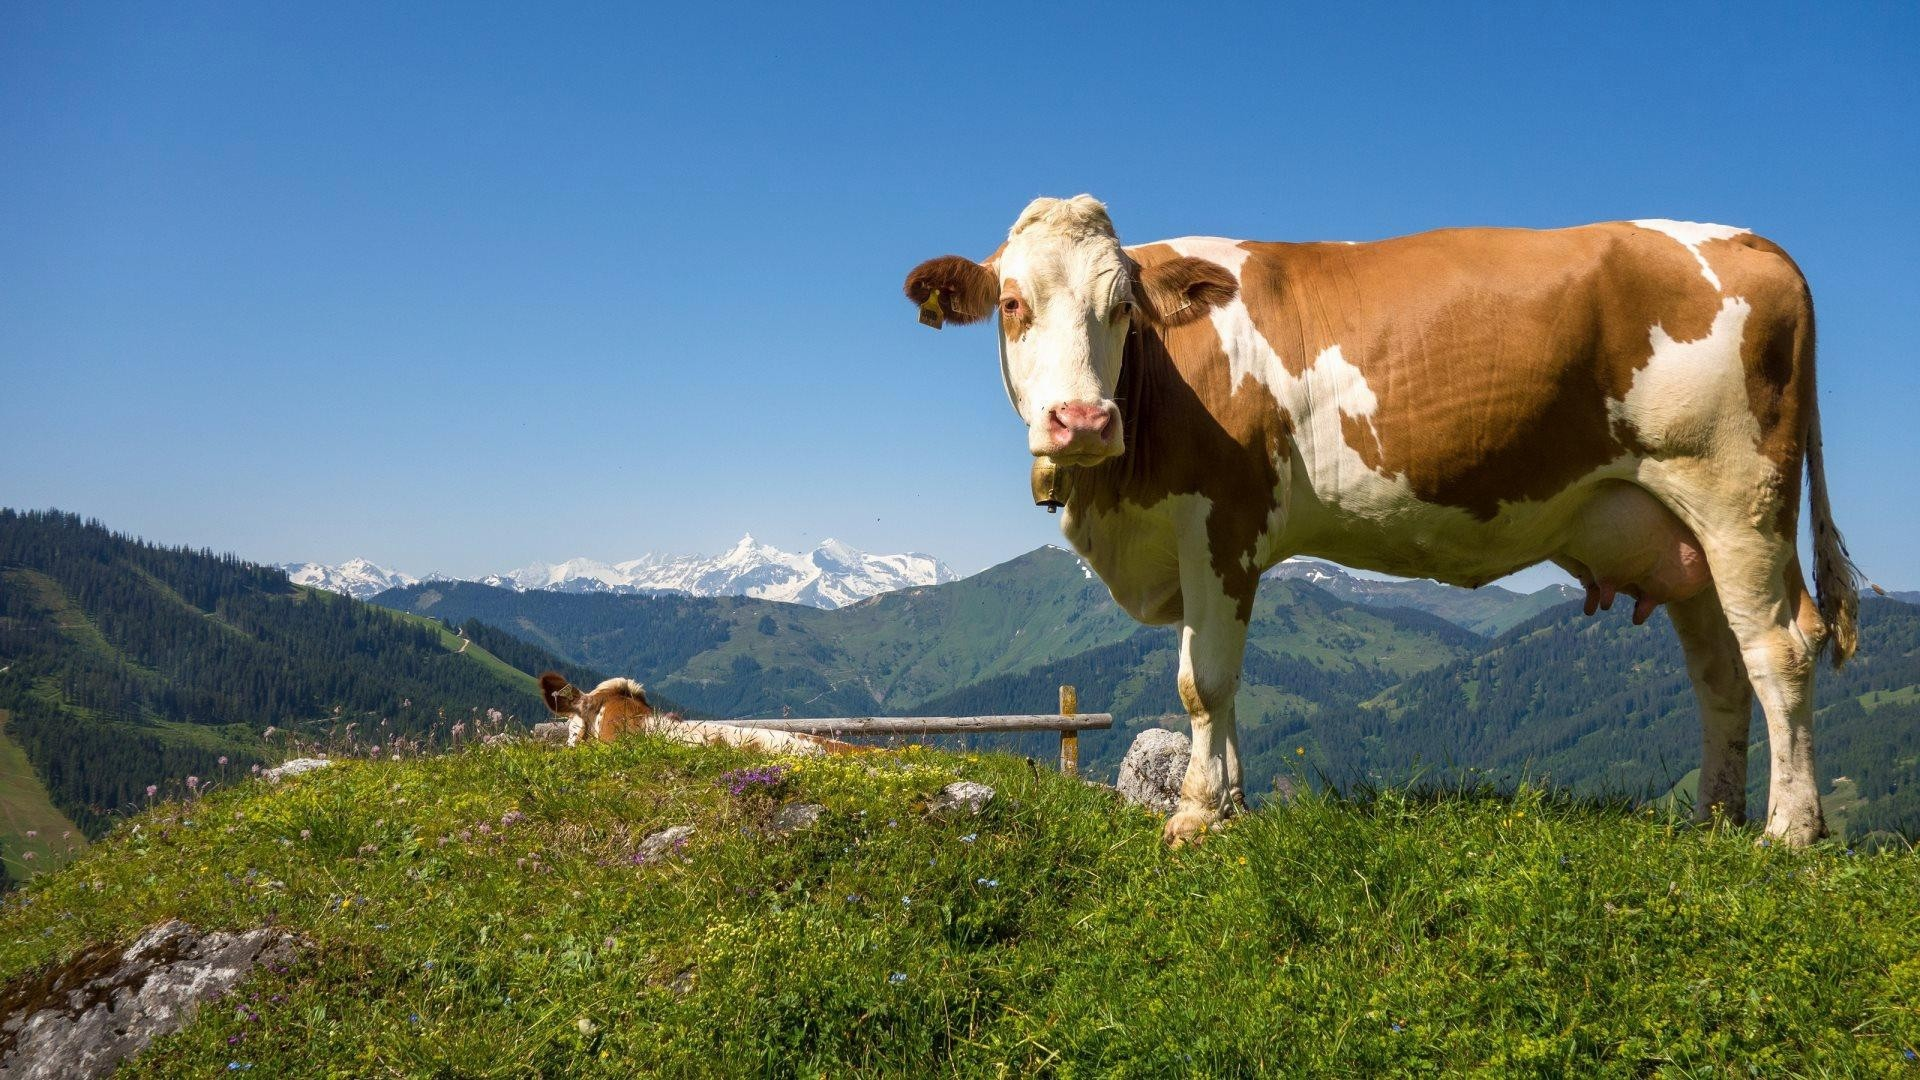 Cow computer wallpaper